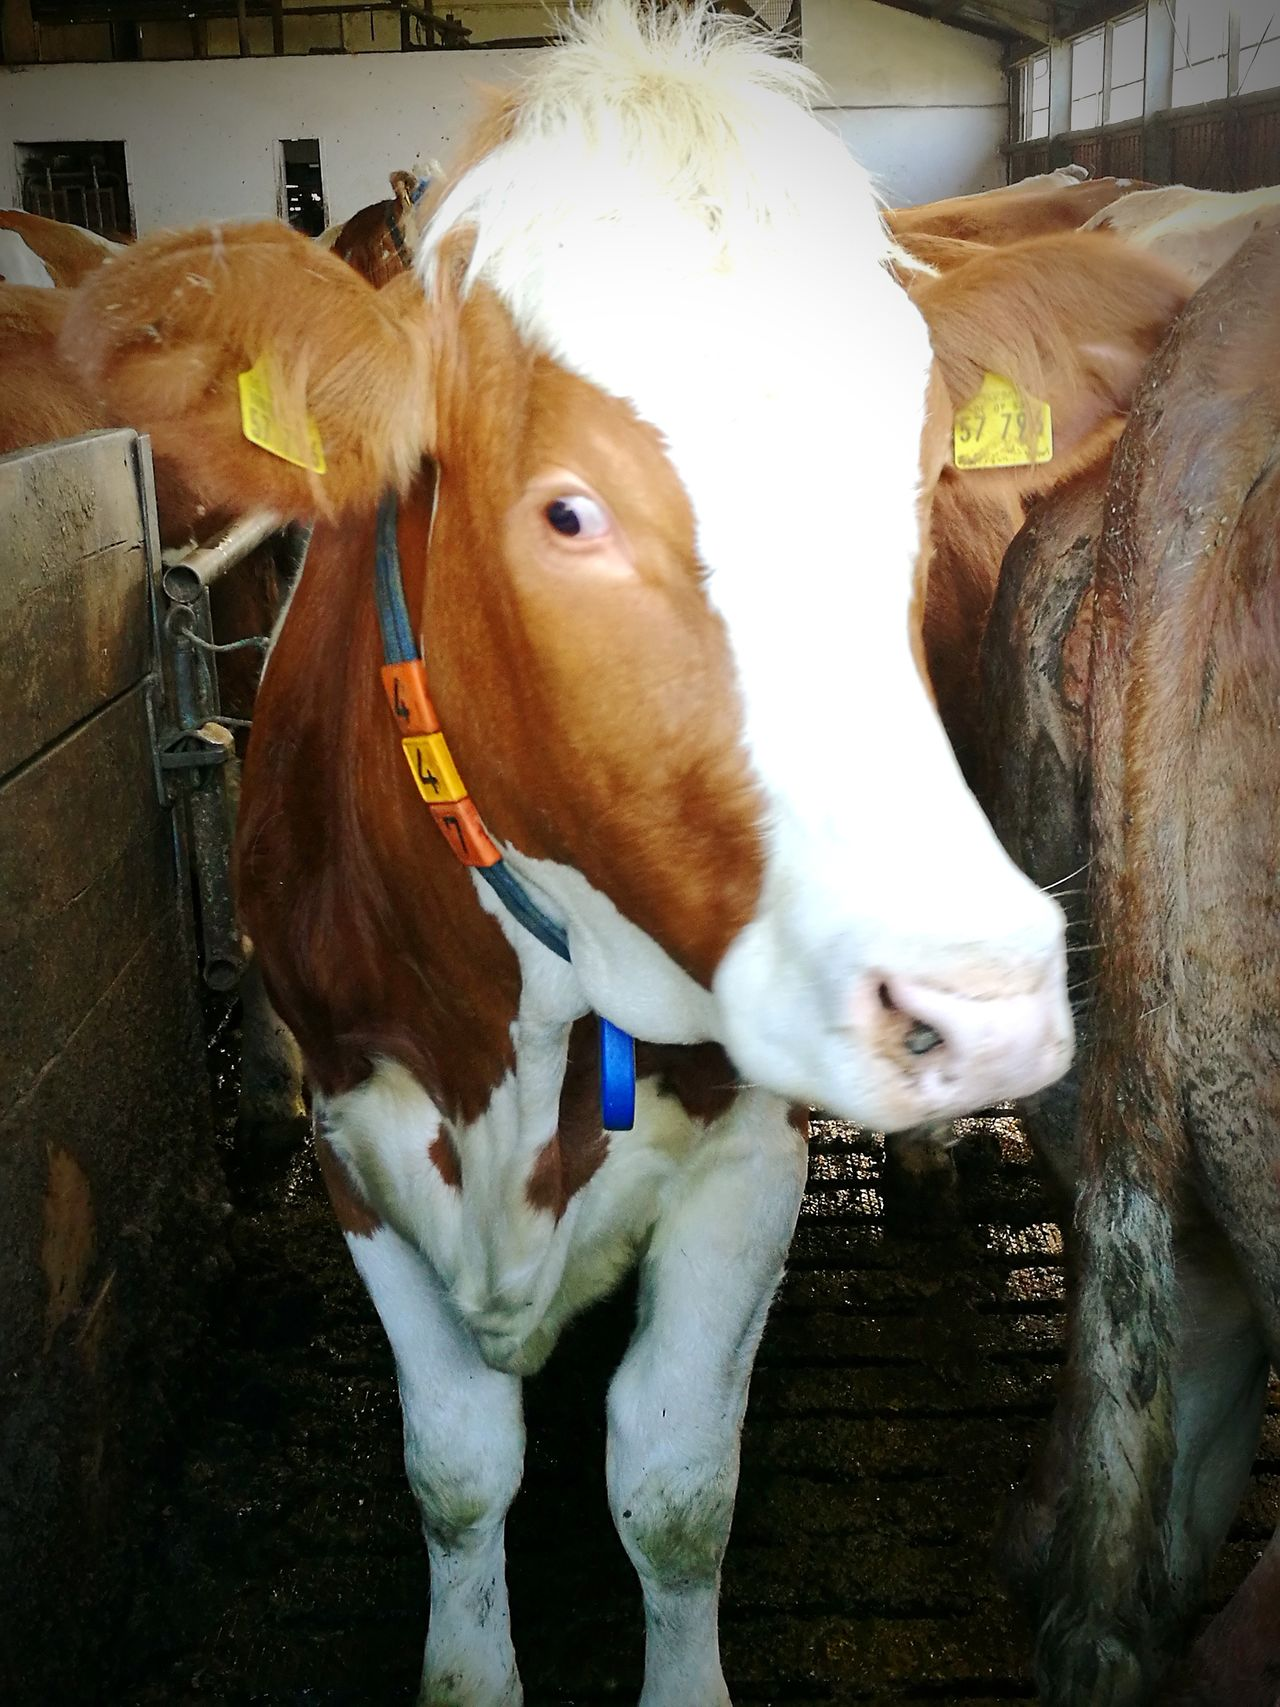 Domestic Animals Animal Themes One Animal No People Cow Milk Gerda